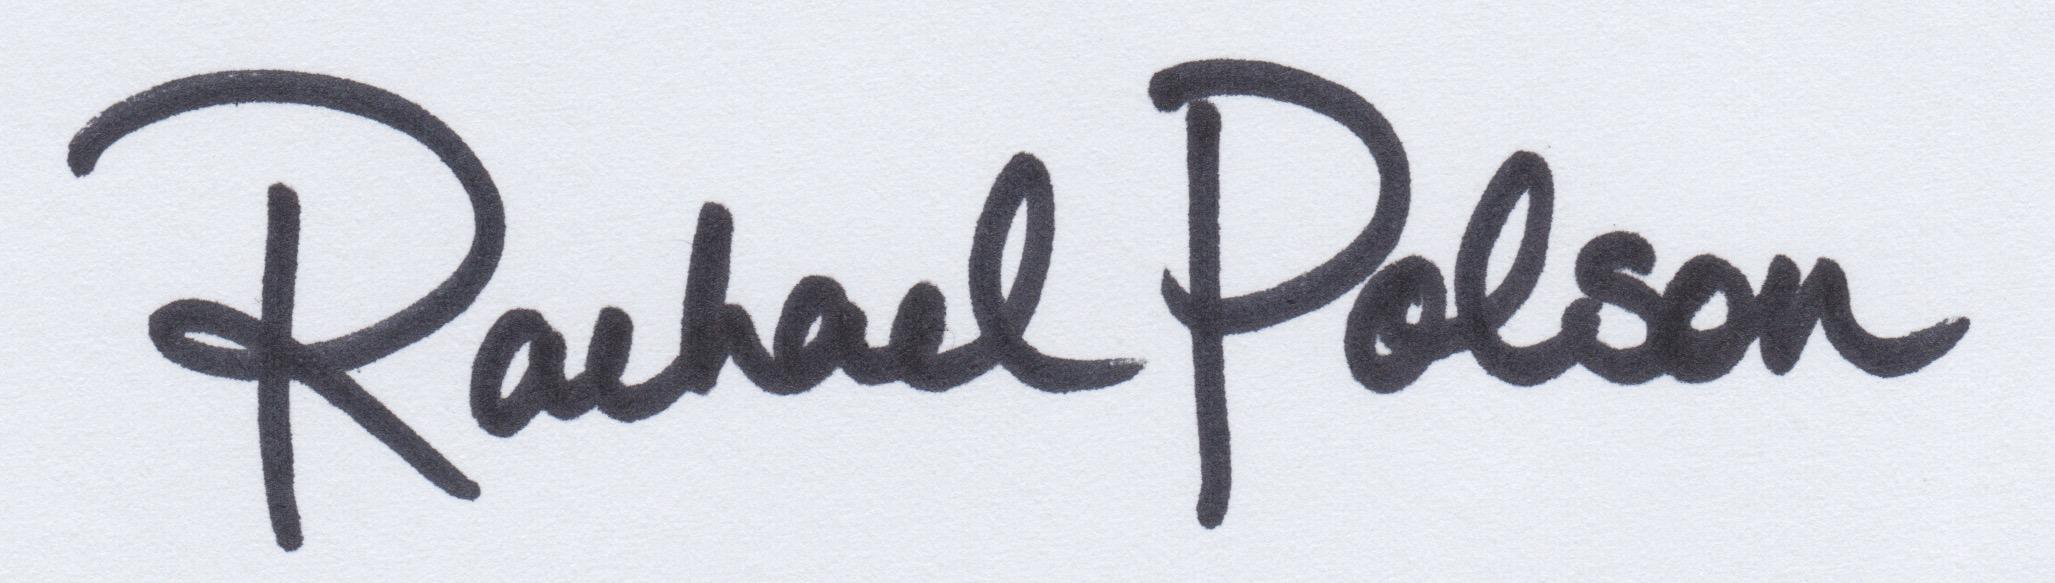 Rachael Polson's Signature